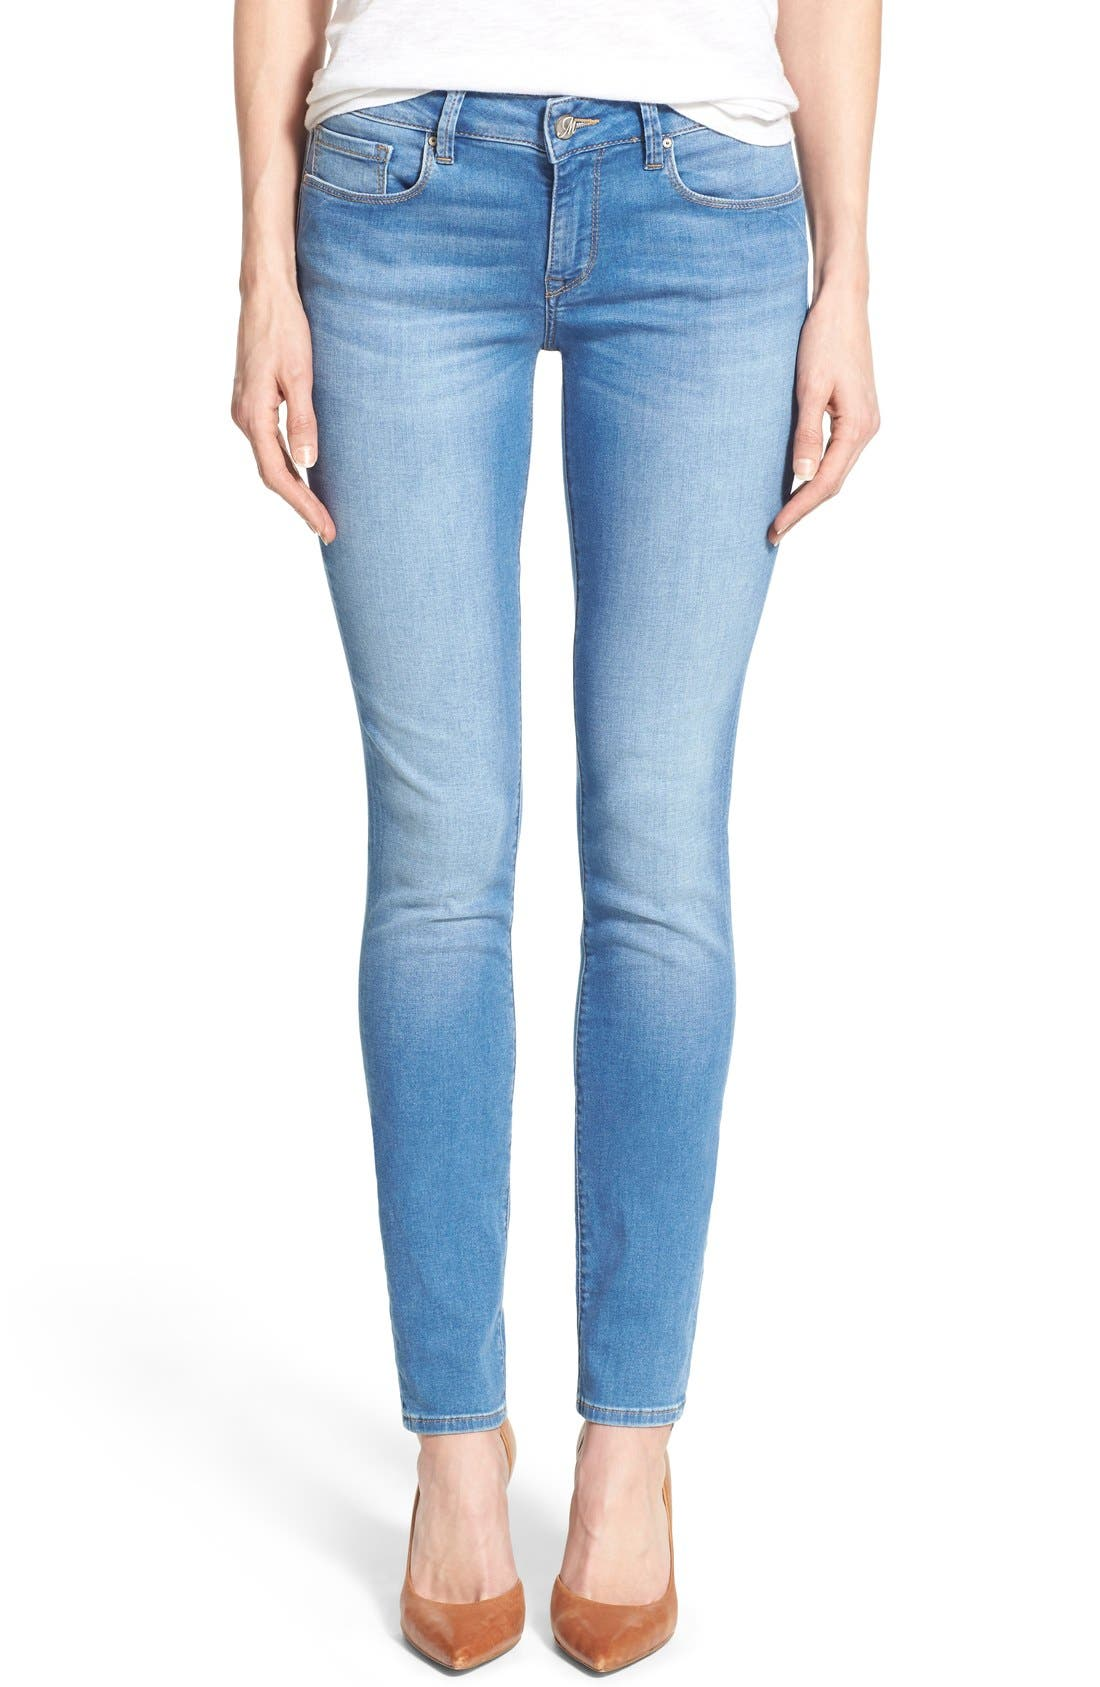 Mavi Jeans Alexa Stretch Skinny Jeans (Light Brushed Shanti) (Online Only)